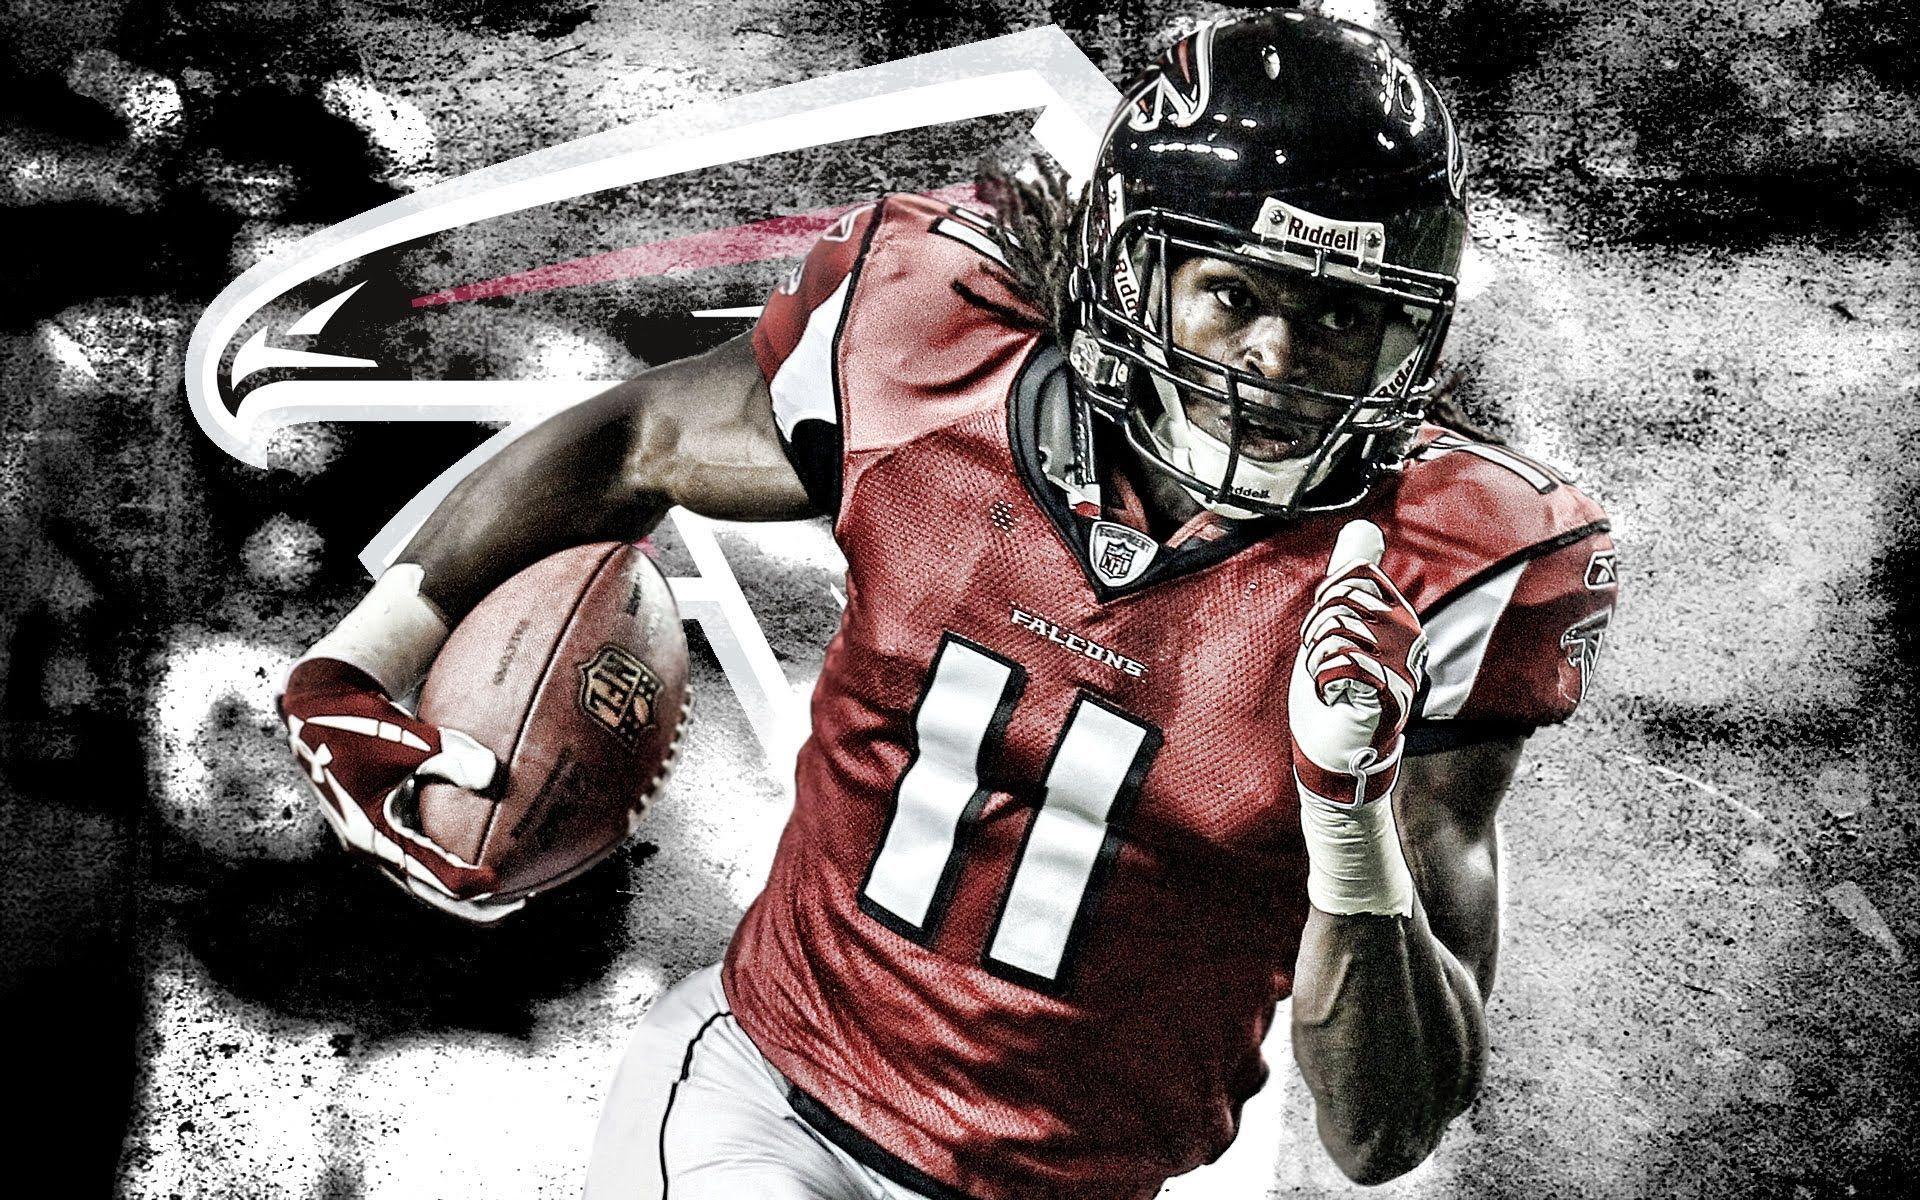 Related image NFL Atlanta falcons Falcons Football helmets 1920x1200